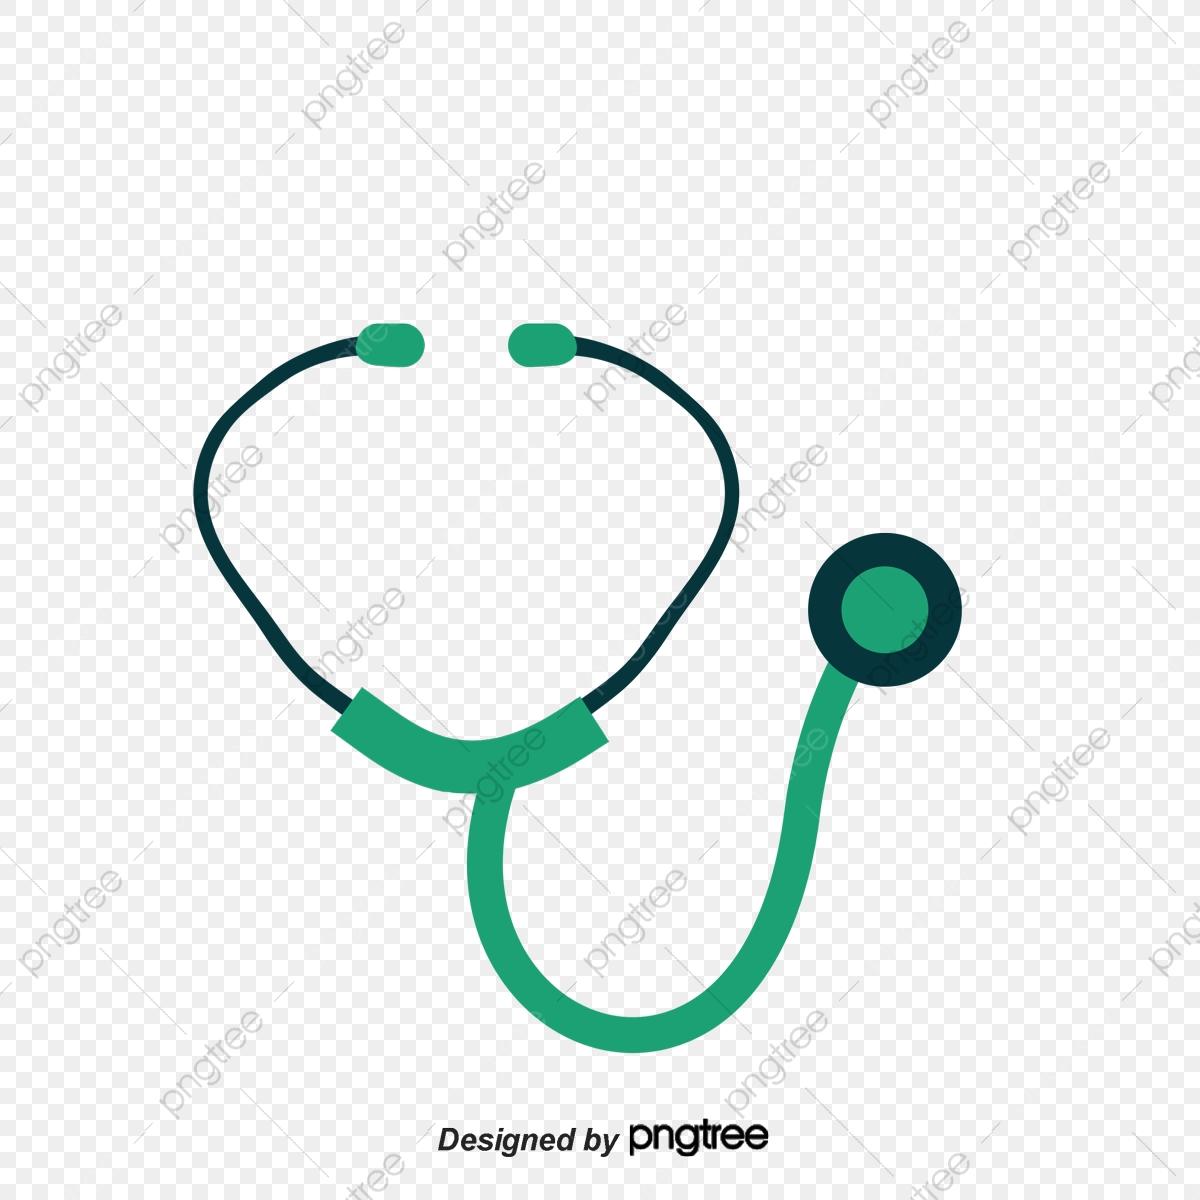 svg transparent stock Vector cartoons stethoscope. Cartoon medical equipment